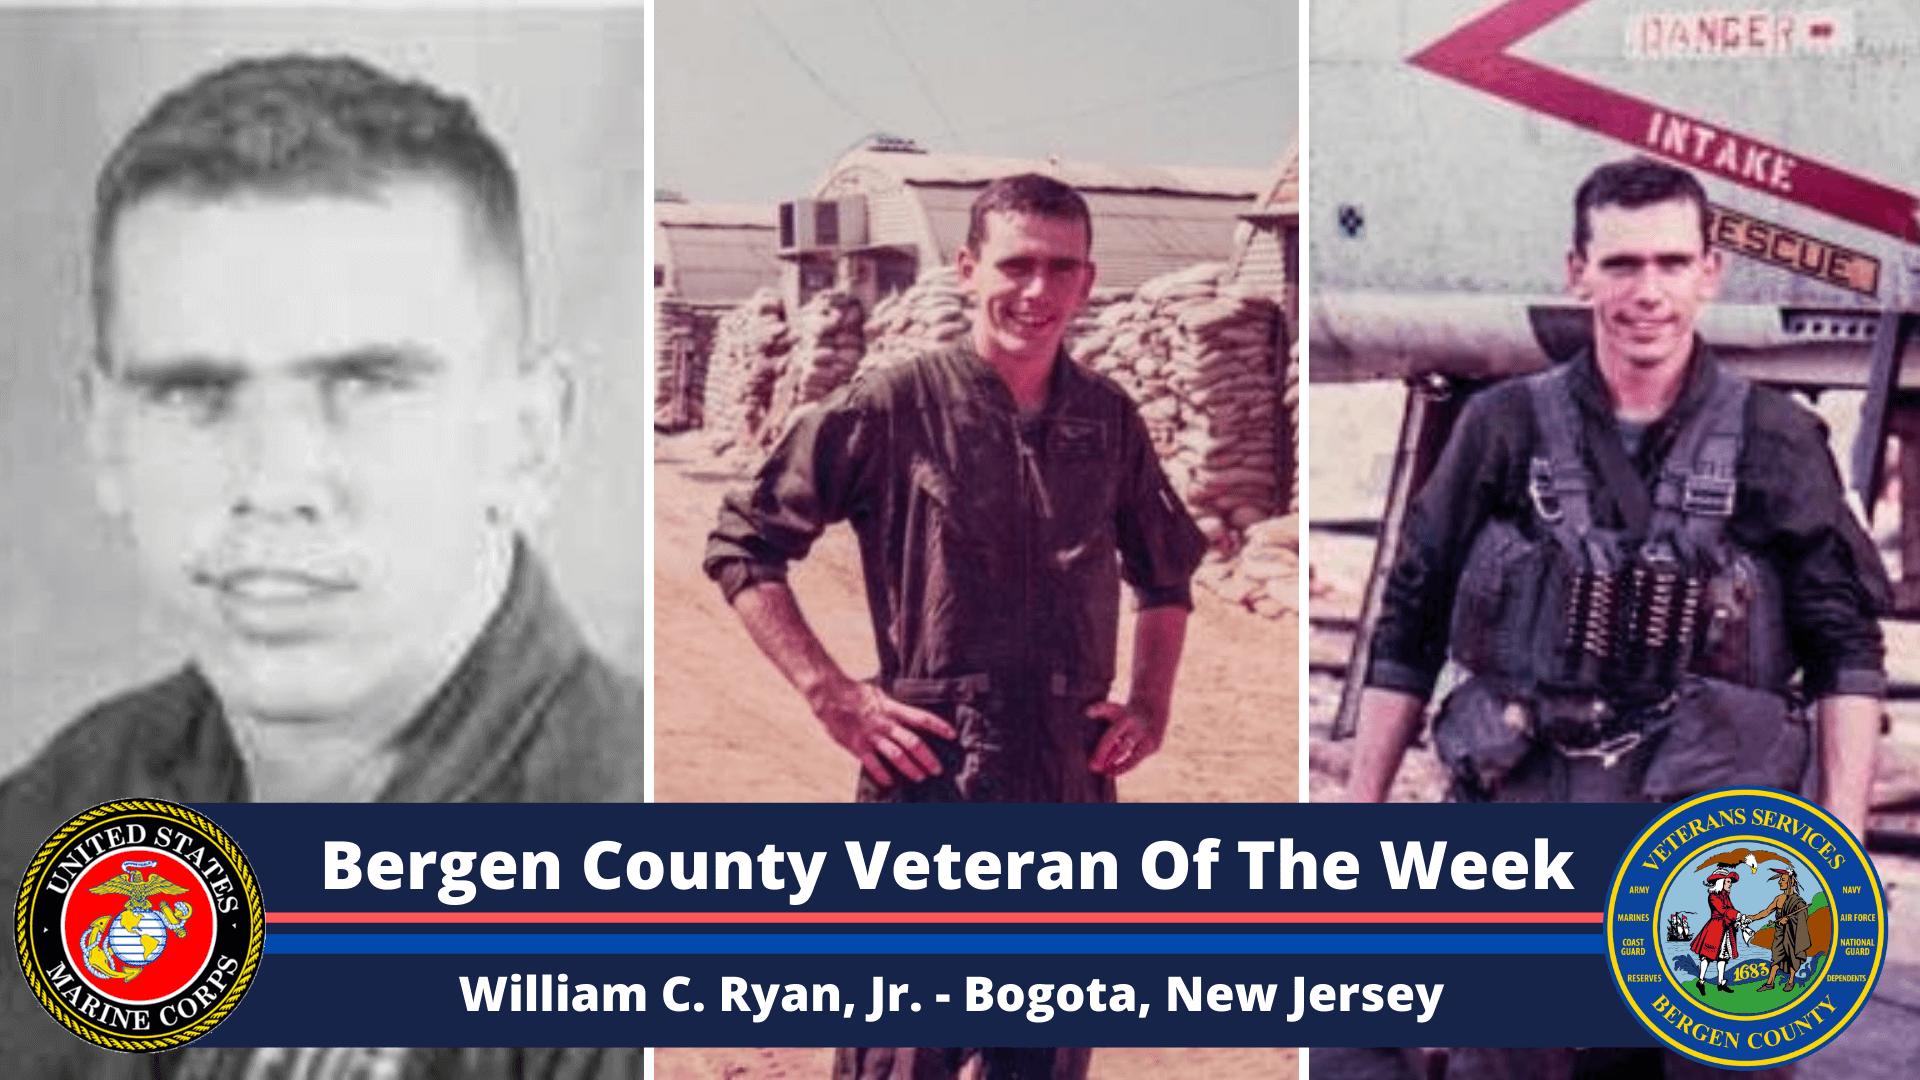 Bergen County Veteran of the Week: William C. Ryan, Jr.